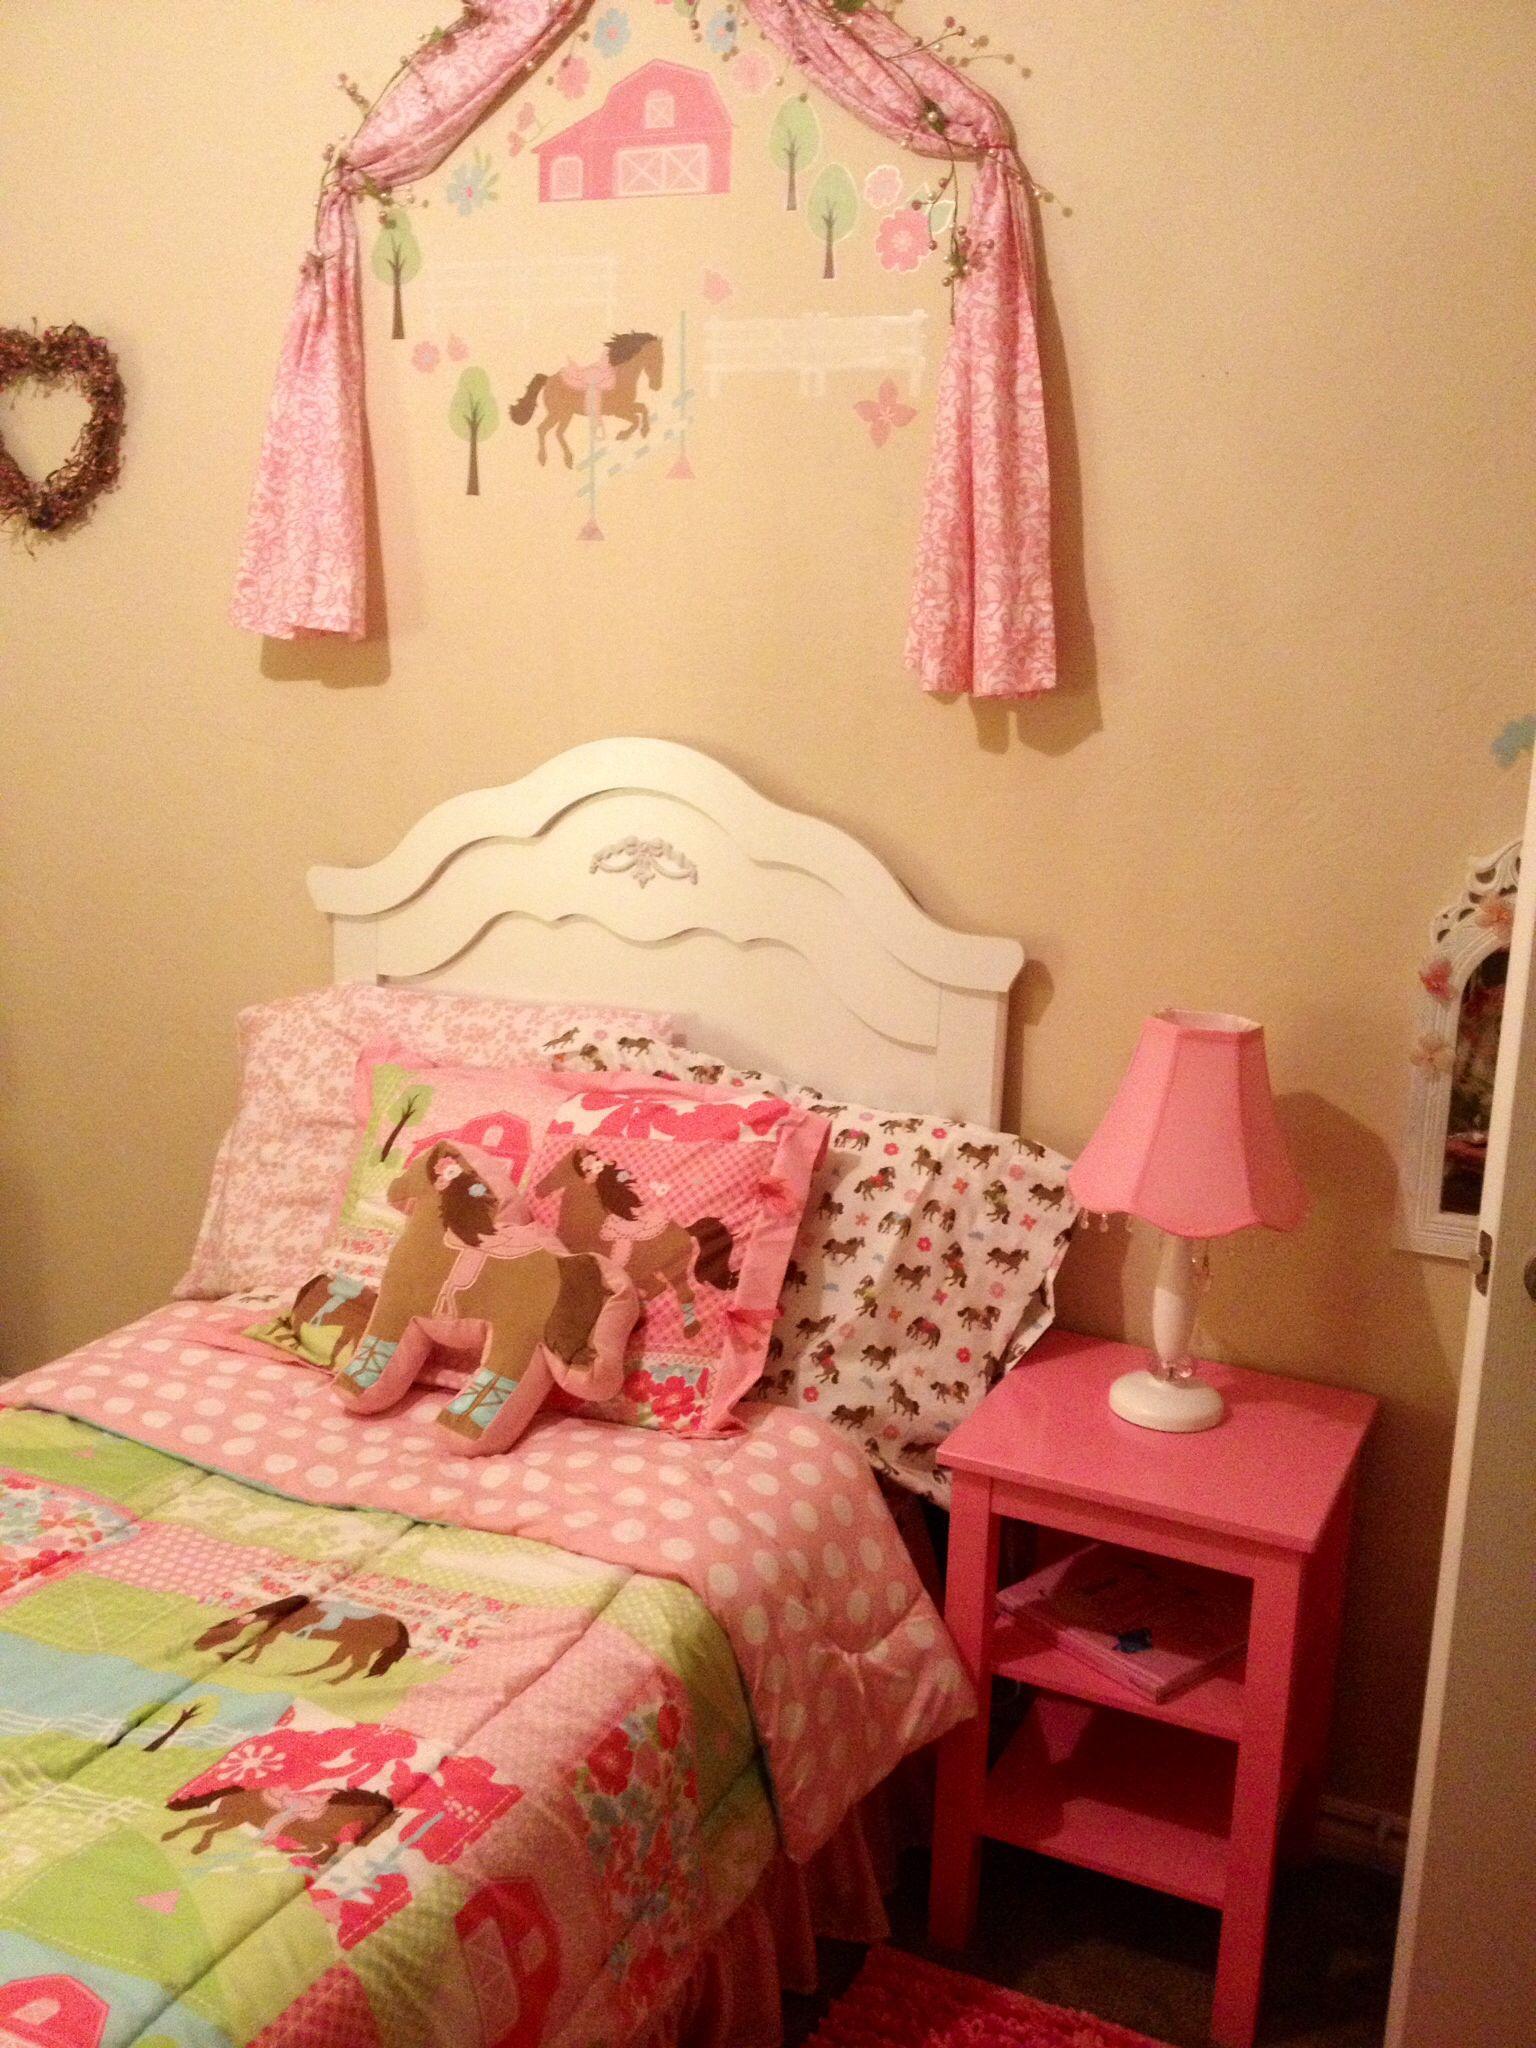 Target Circo Pretty Horses bedding Target fairy tale pink night ...